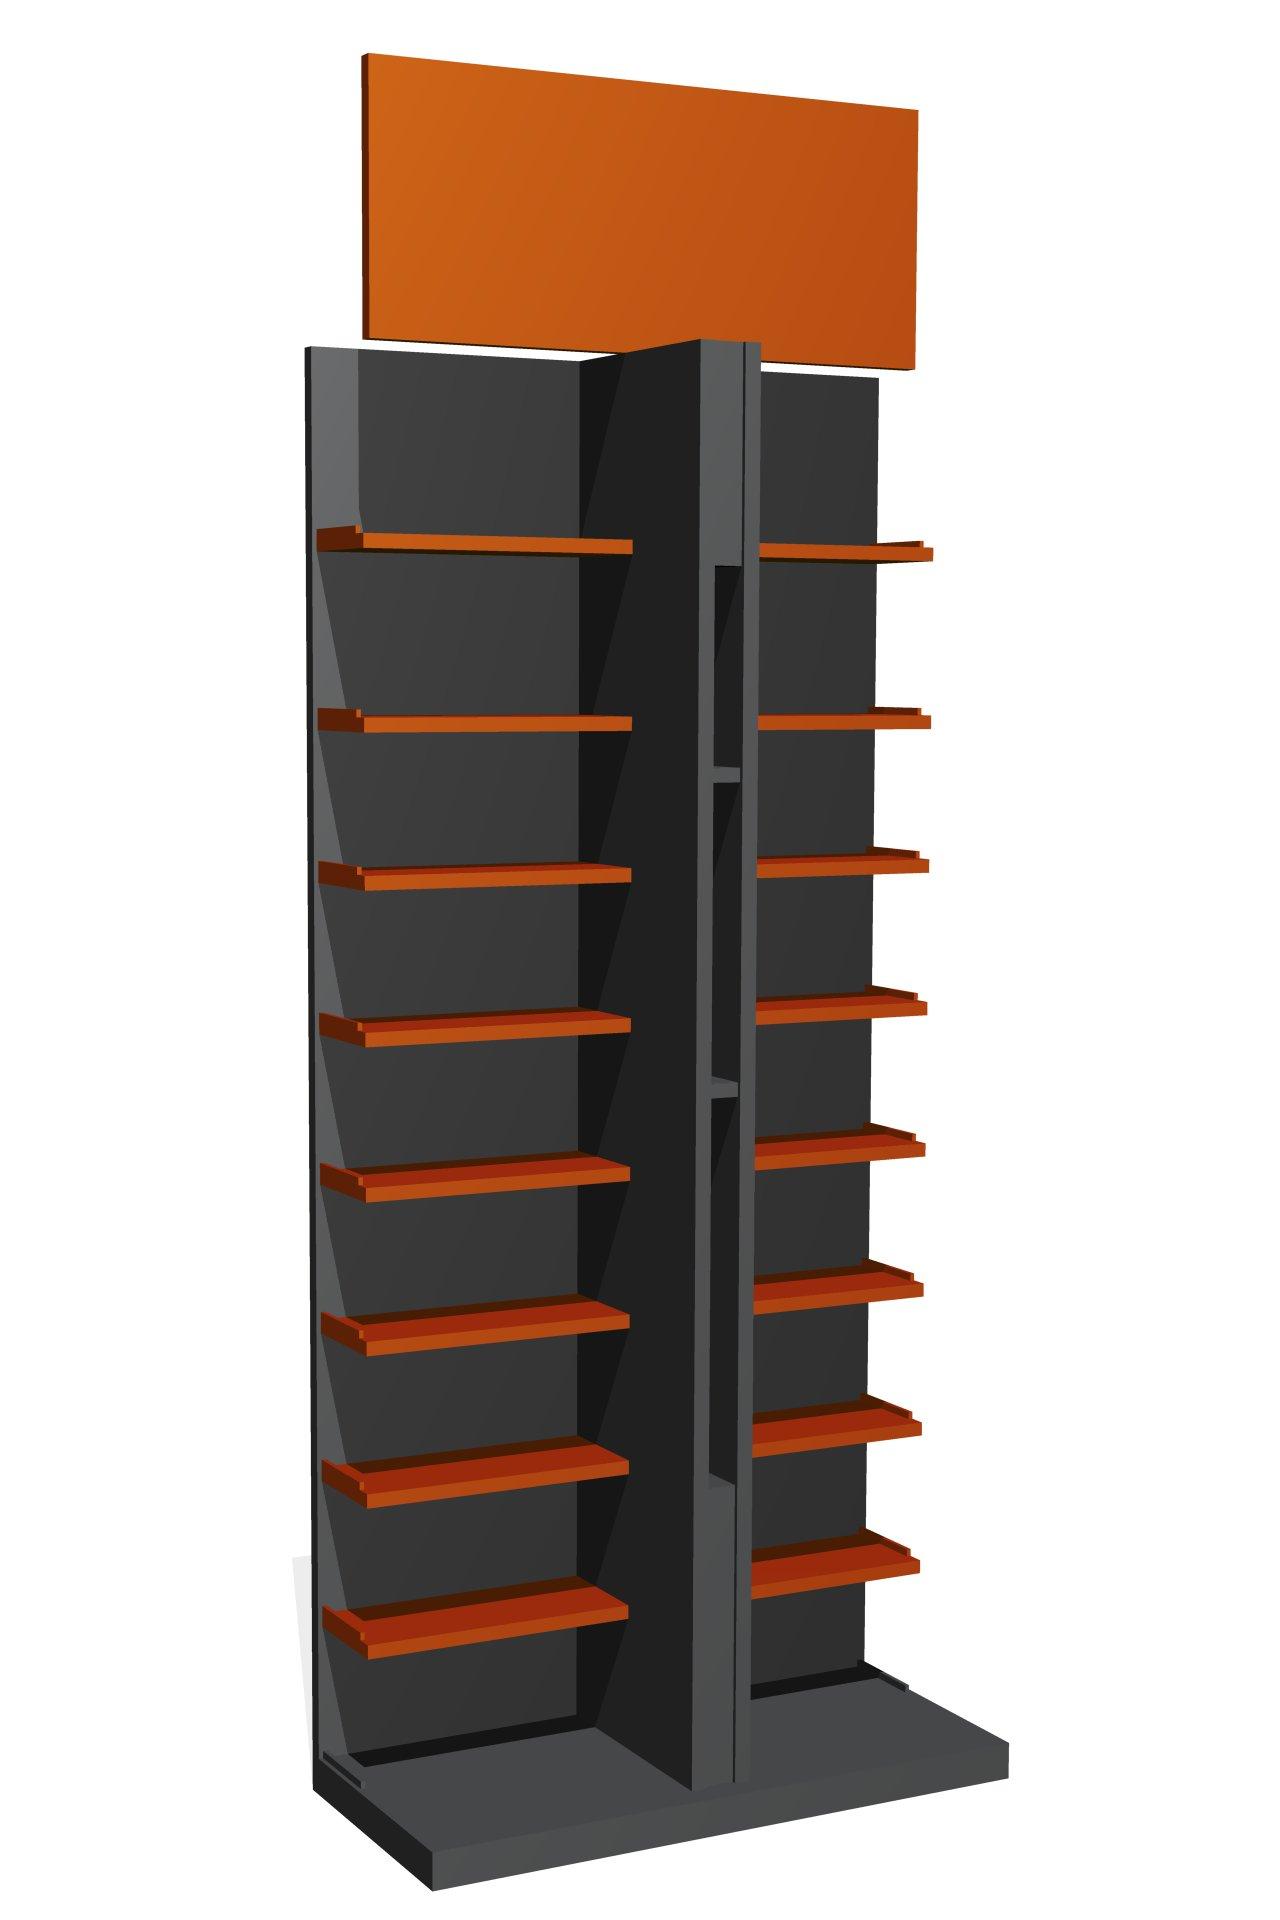 san 808 08 85 buyck displays. Black Bedroom Furniture Sets. Home Design Ideas